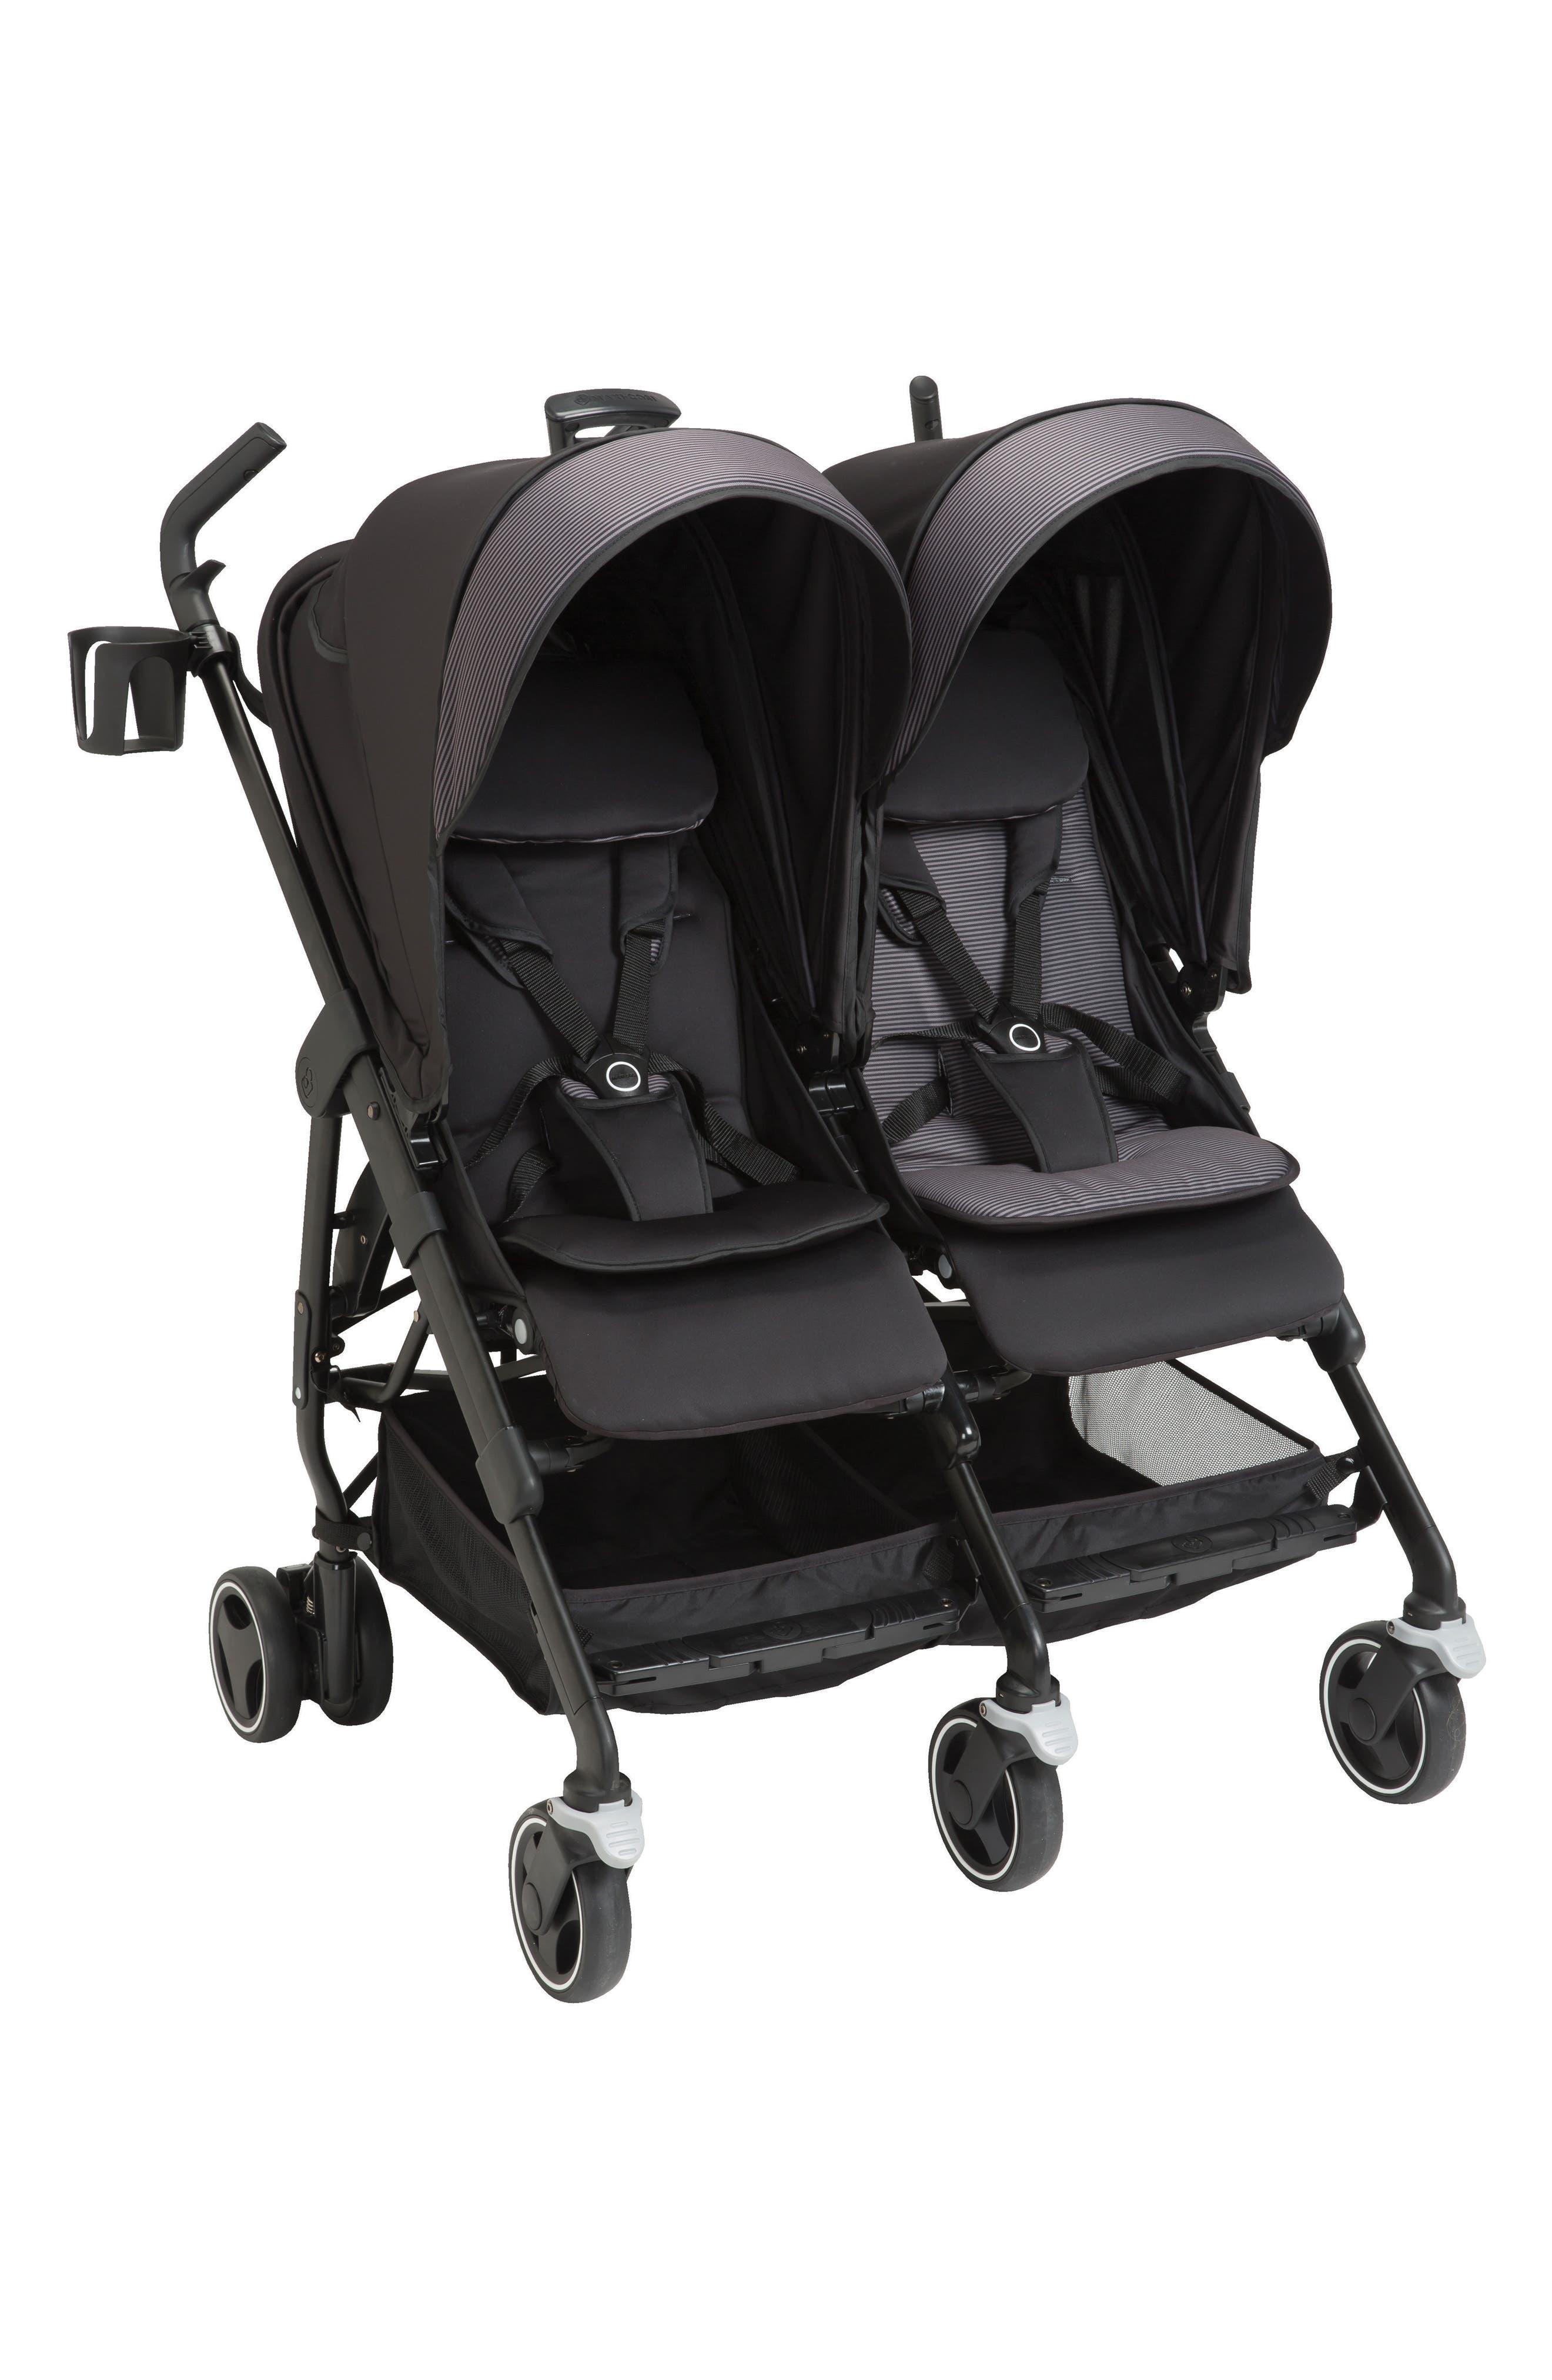 Infant MaxiCosi Dana For 2 Double Stroller Size One Size  Black